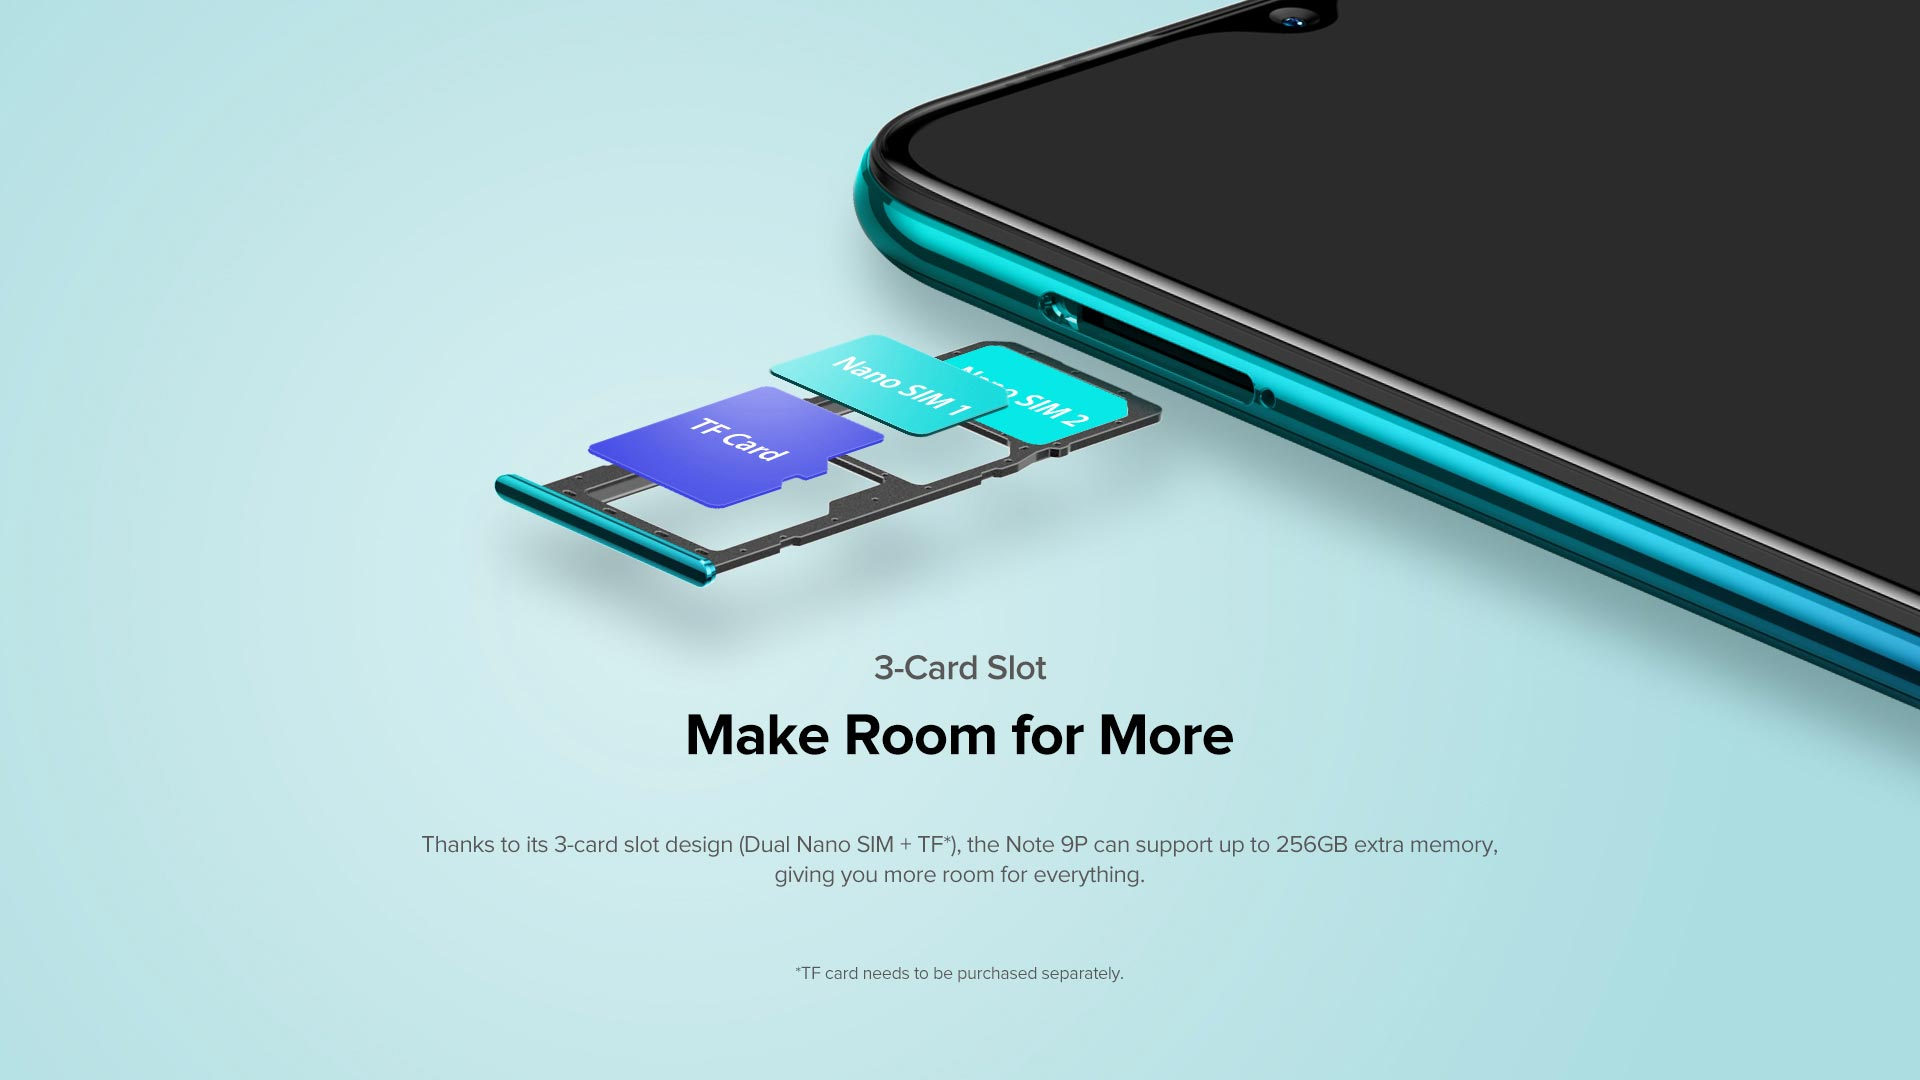 Ulefone Note 9P Smartphone